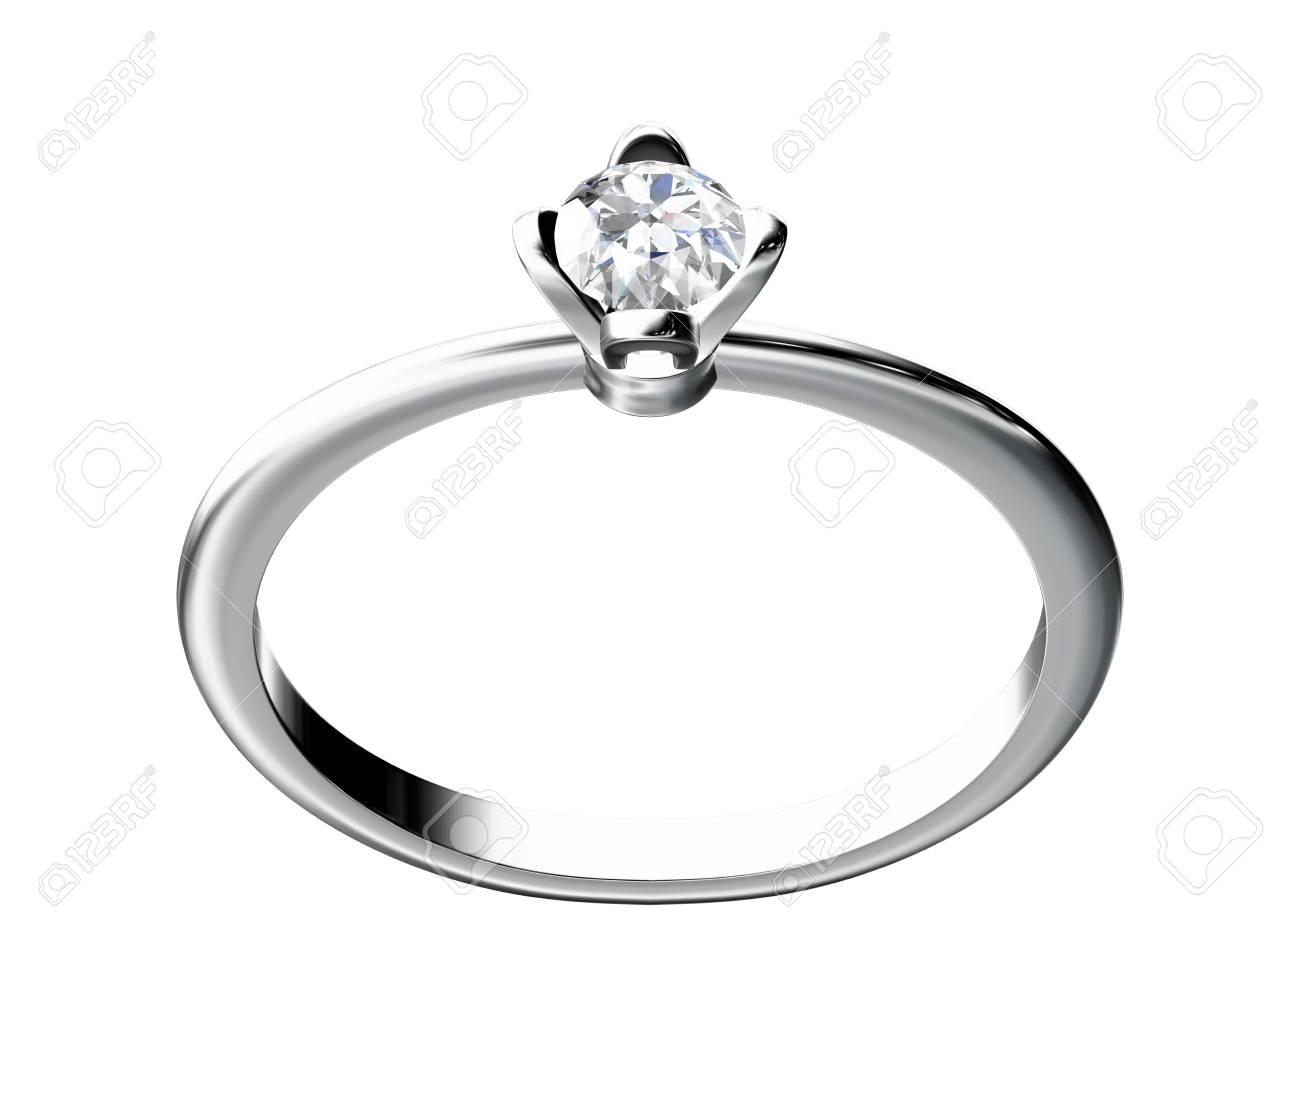 The beauty wedding ring on white background Stock Photo - 10356640